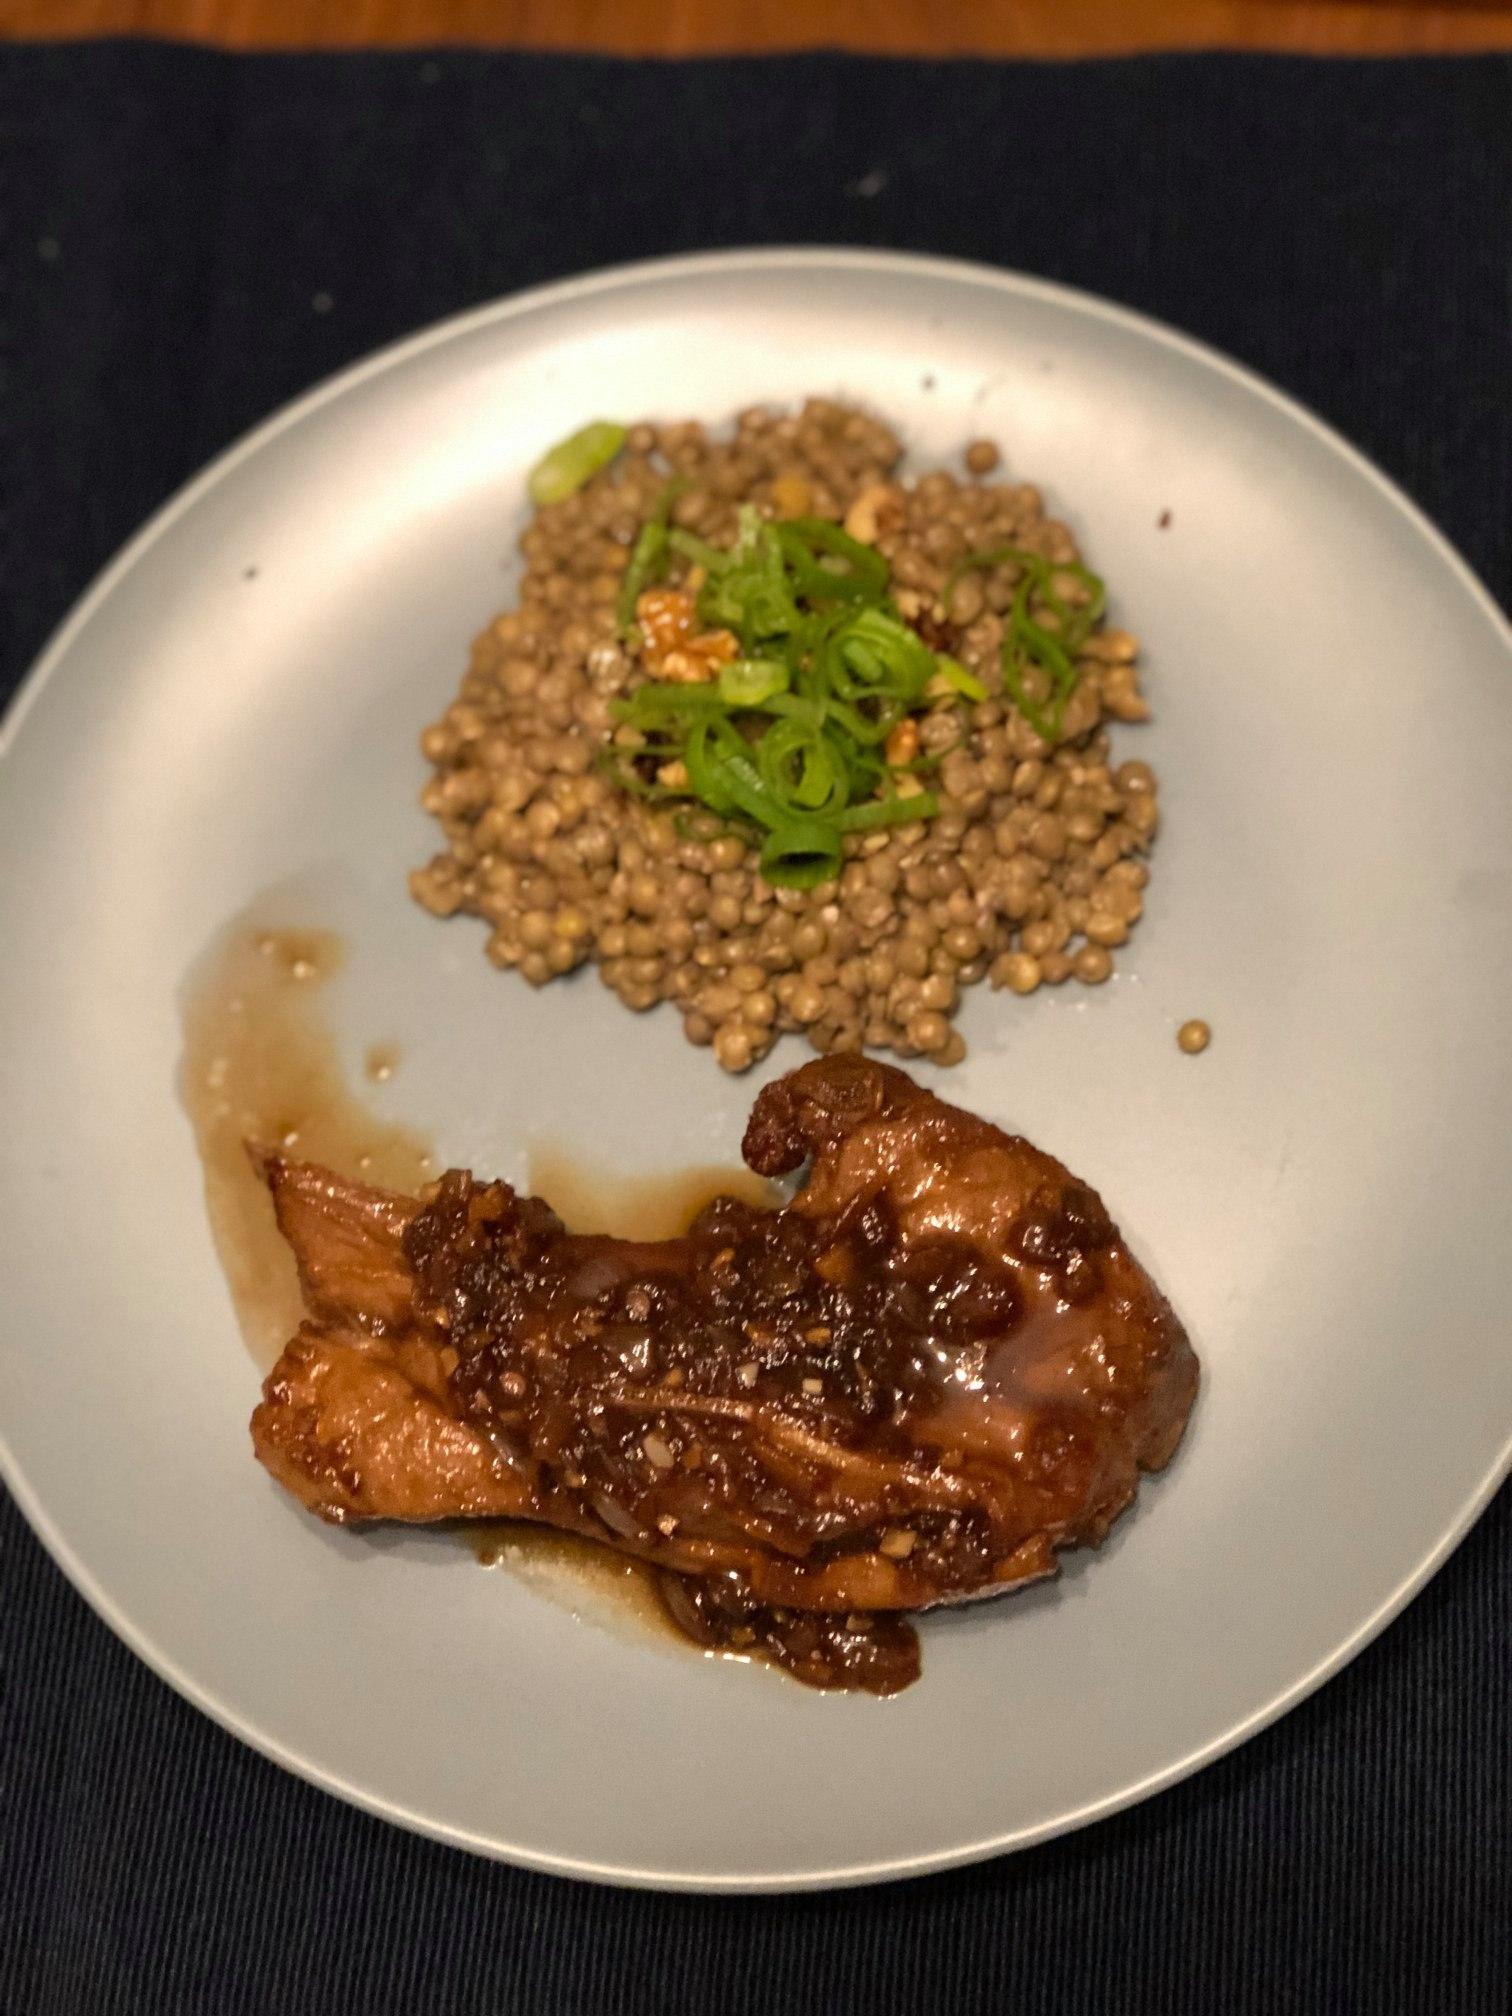 Lentil and Walnut Salad and Asian Lamb Chops